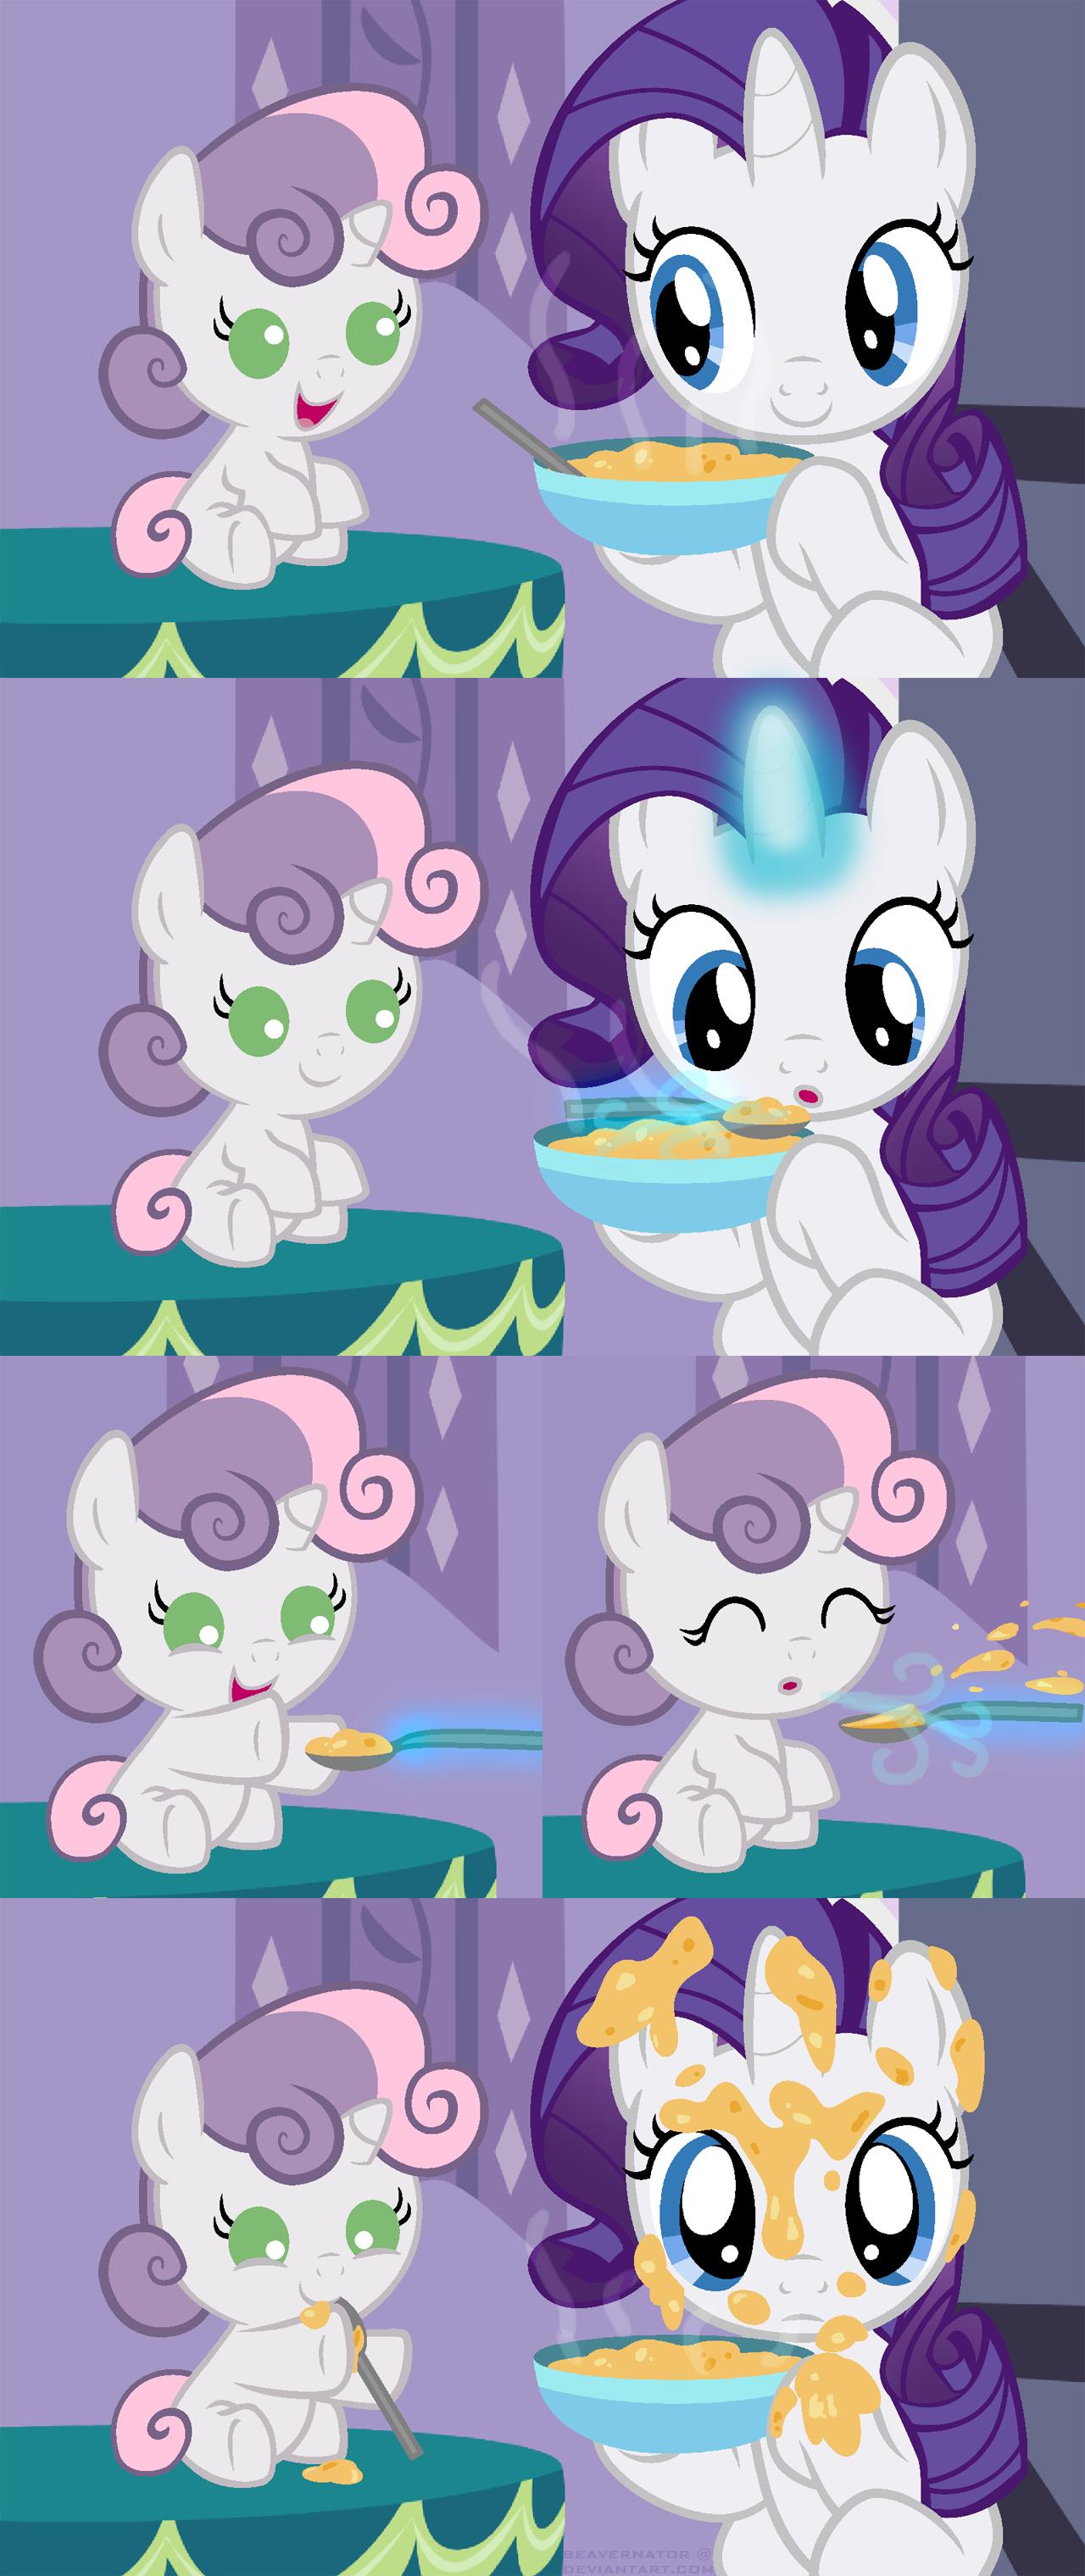 Sweetie Belle Rarity Spike Rainbow Dash Pony Derpy Hooves Scootaloo Cartoon Purple Mammal Vertebrate Horse Like